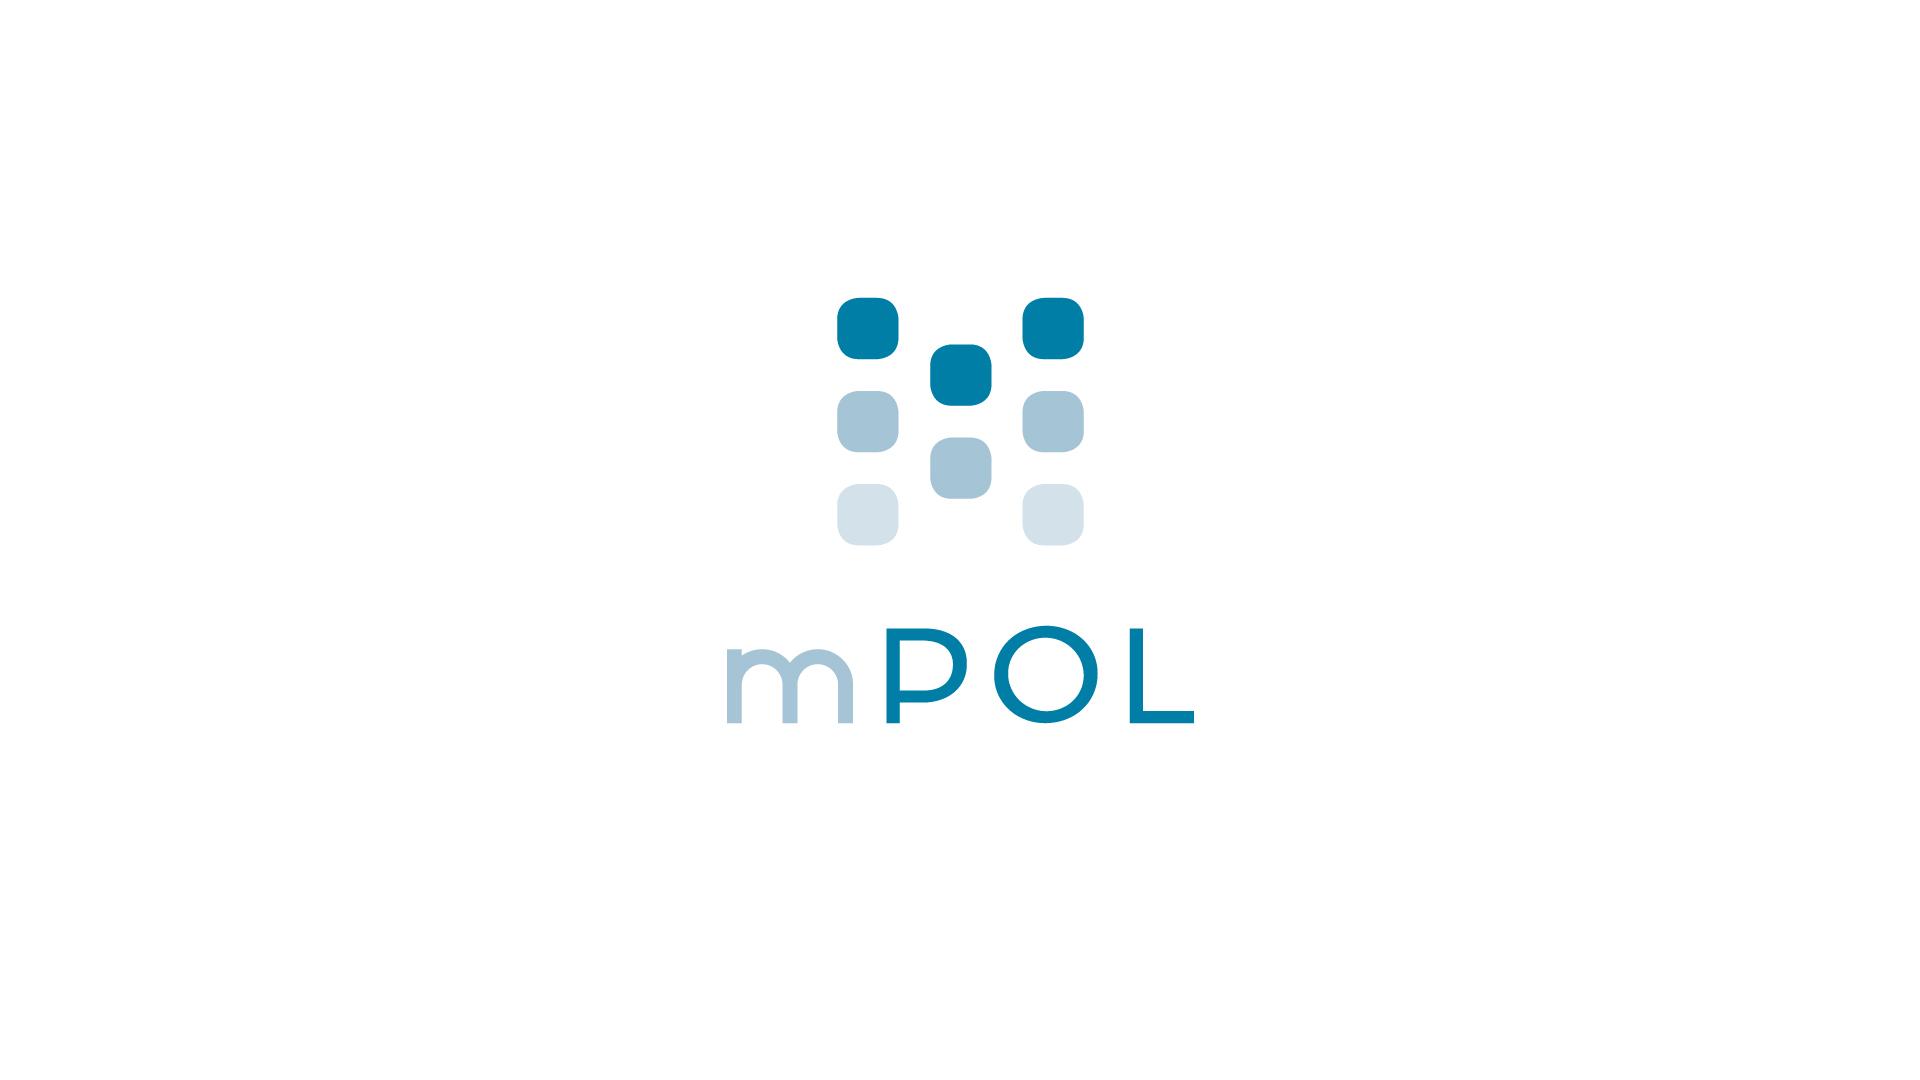 mpol_logo_01